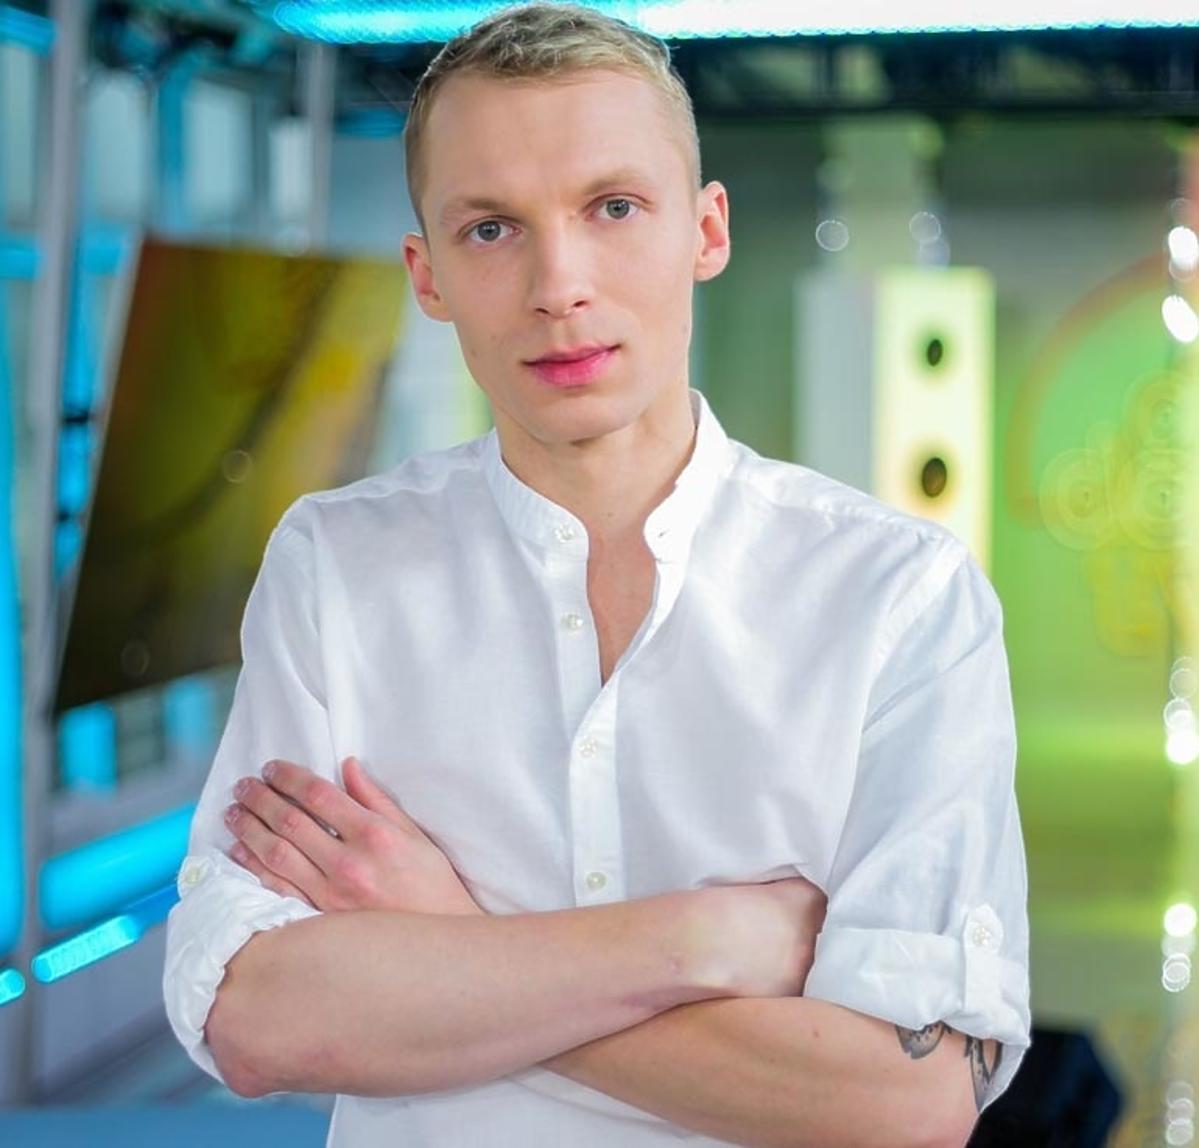 Igor Herbut w białek koszuli